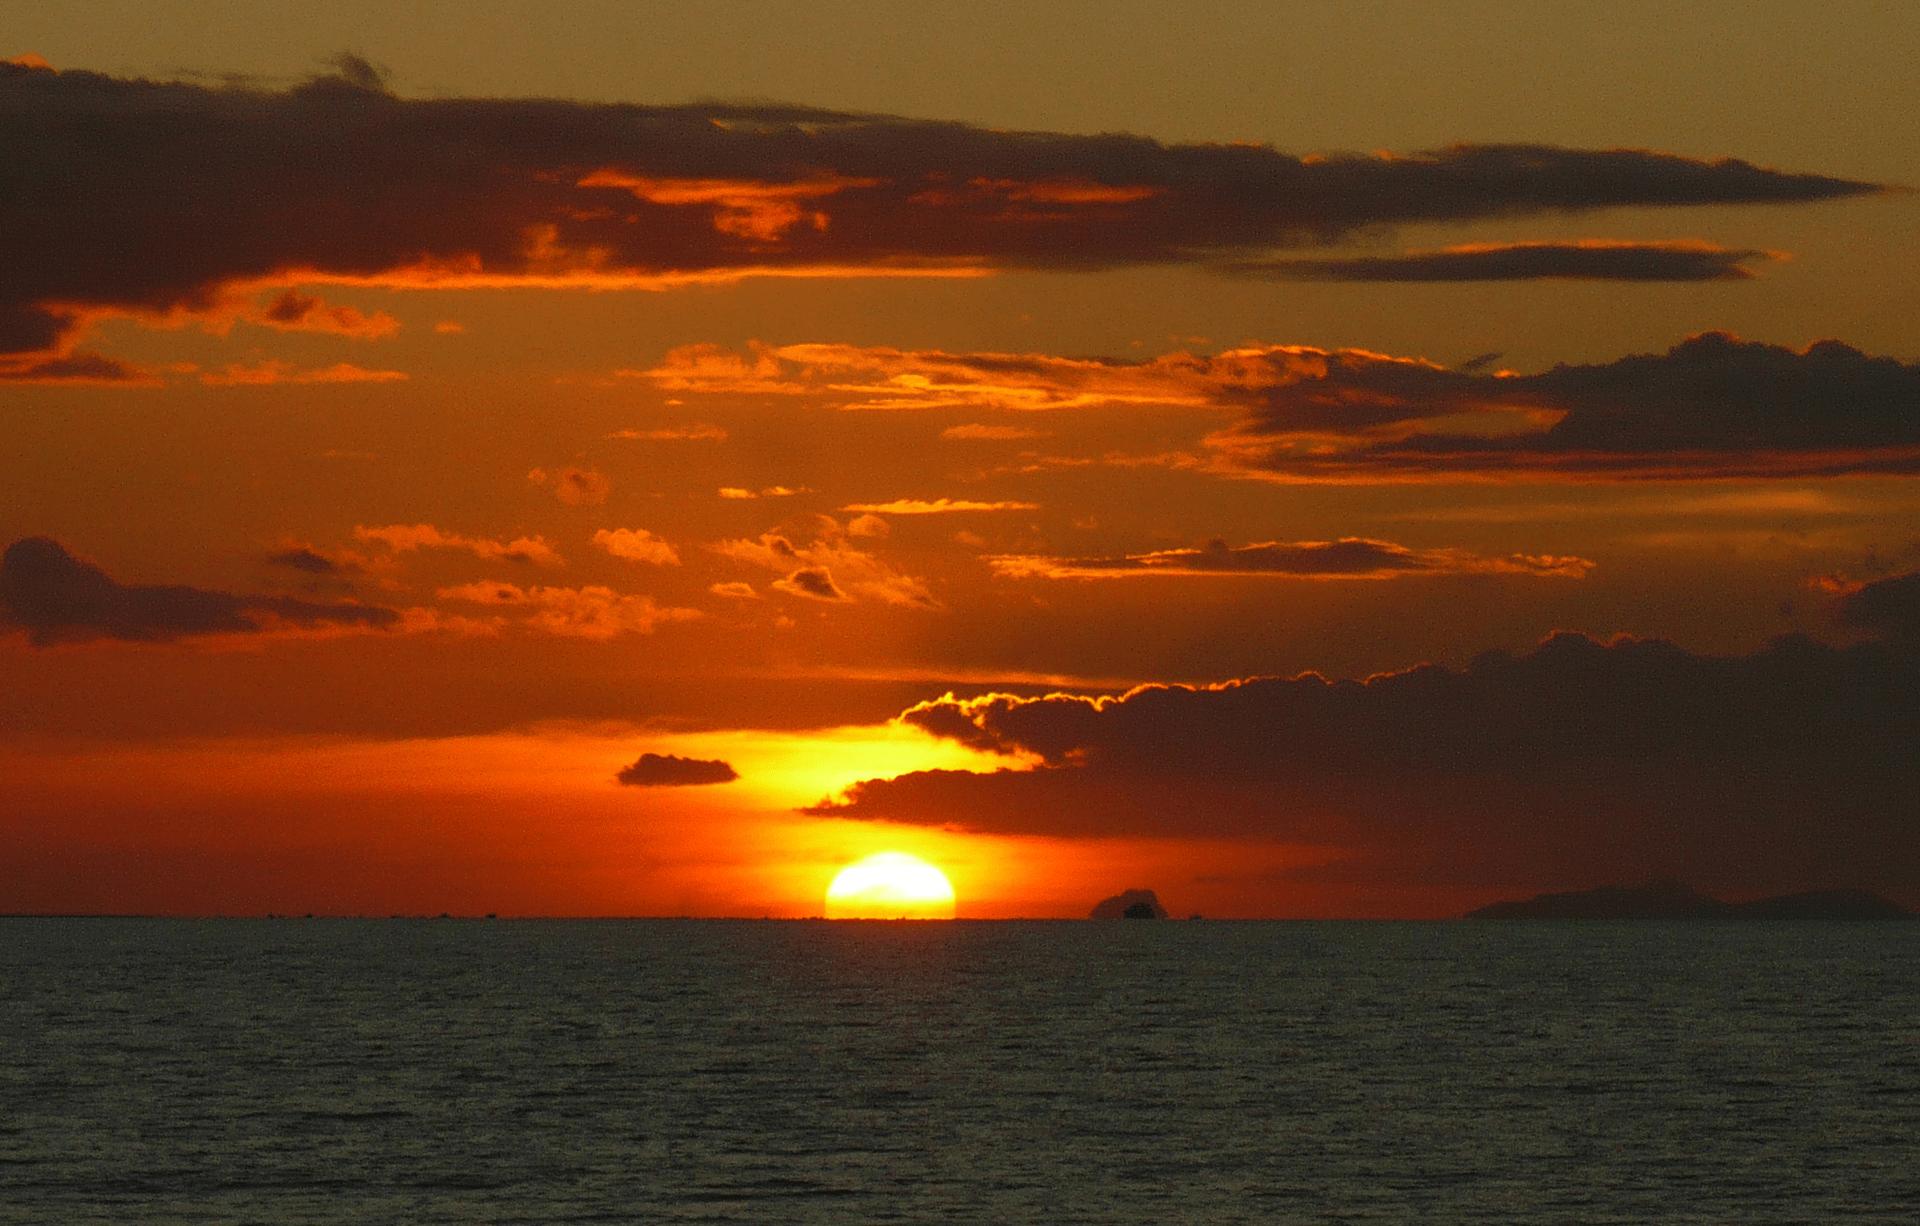 Wailoaloa